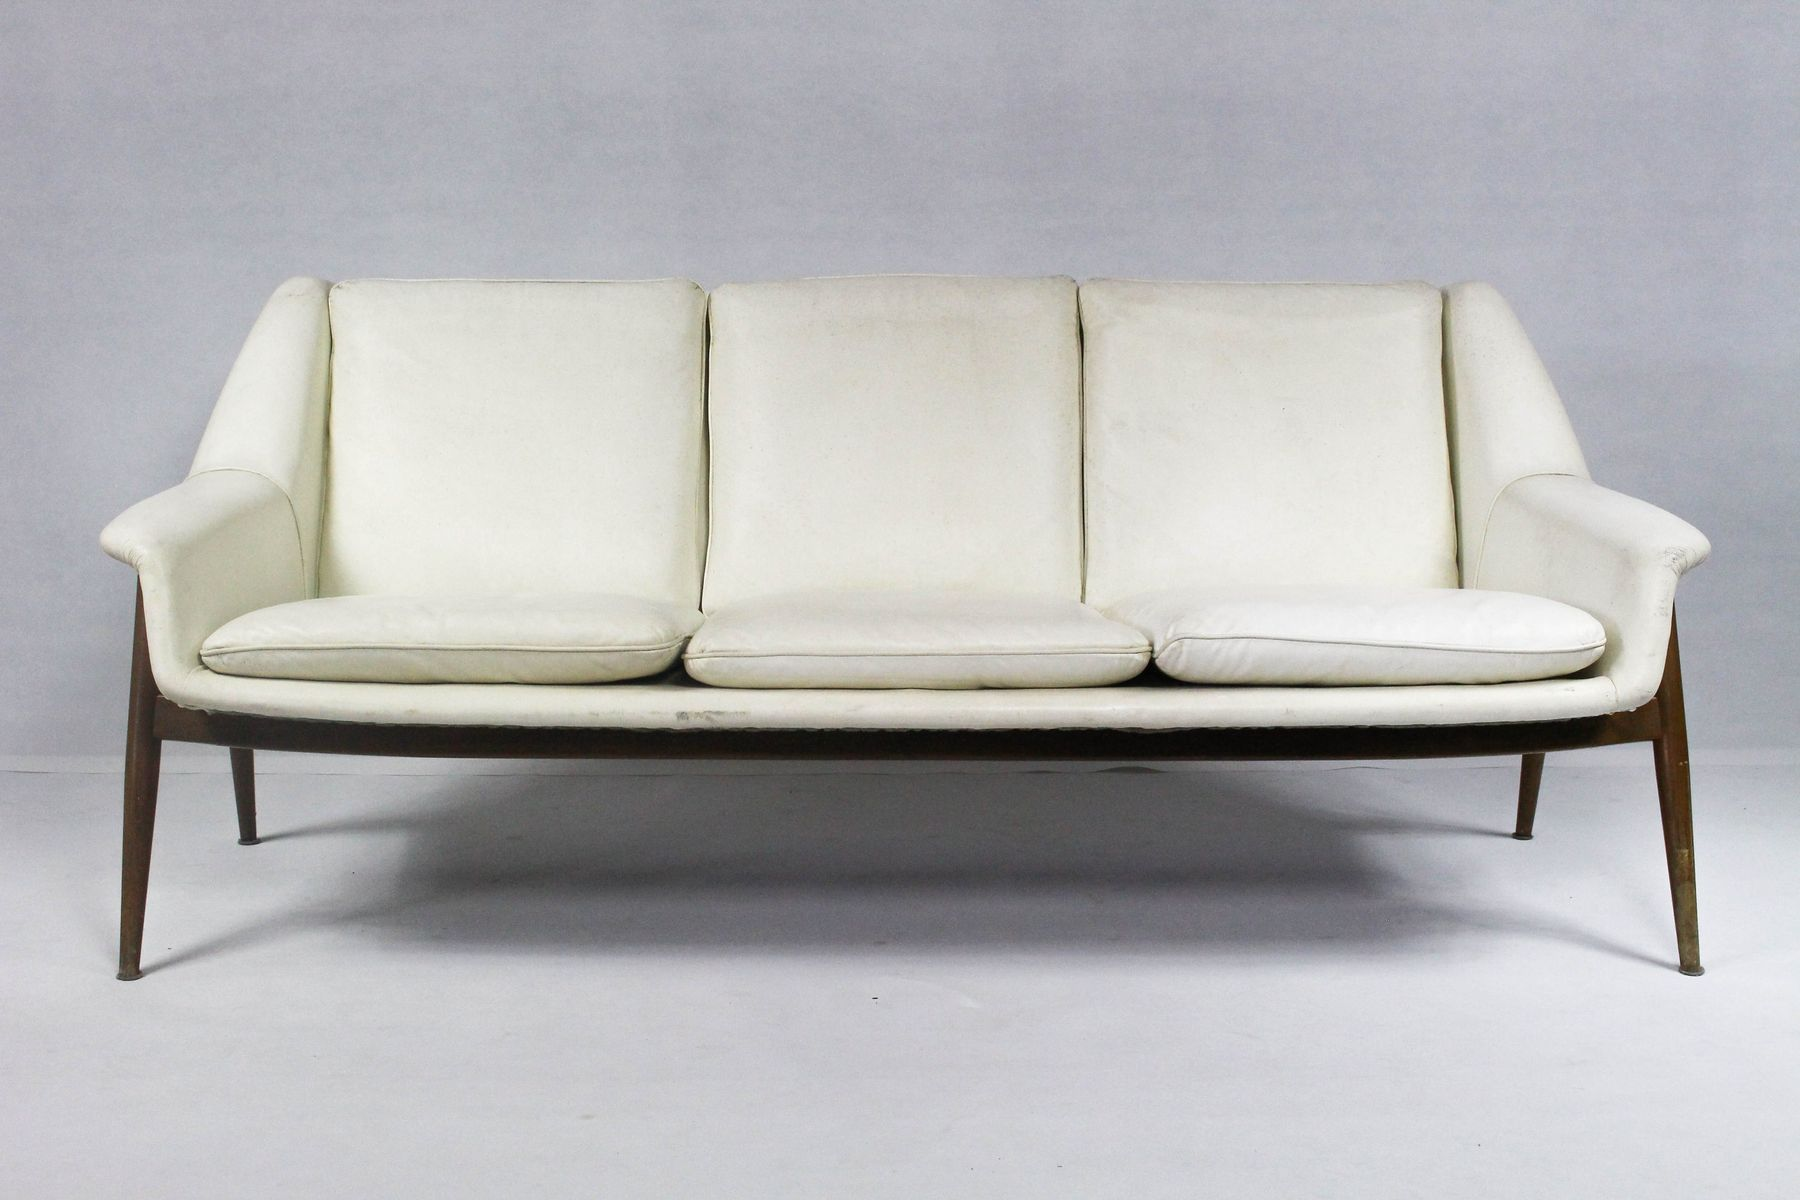 leder sofa von walter knoll f r cassina 1950er bei pamono kaufen. Black Bedroom Furniture Sets. Home Design Ideas